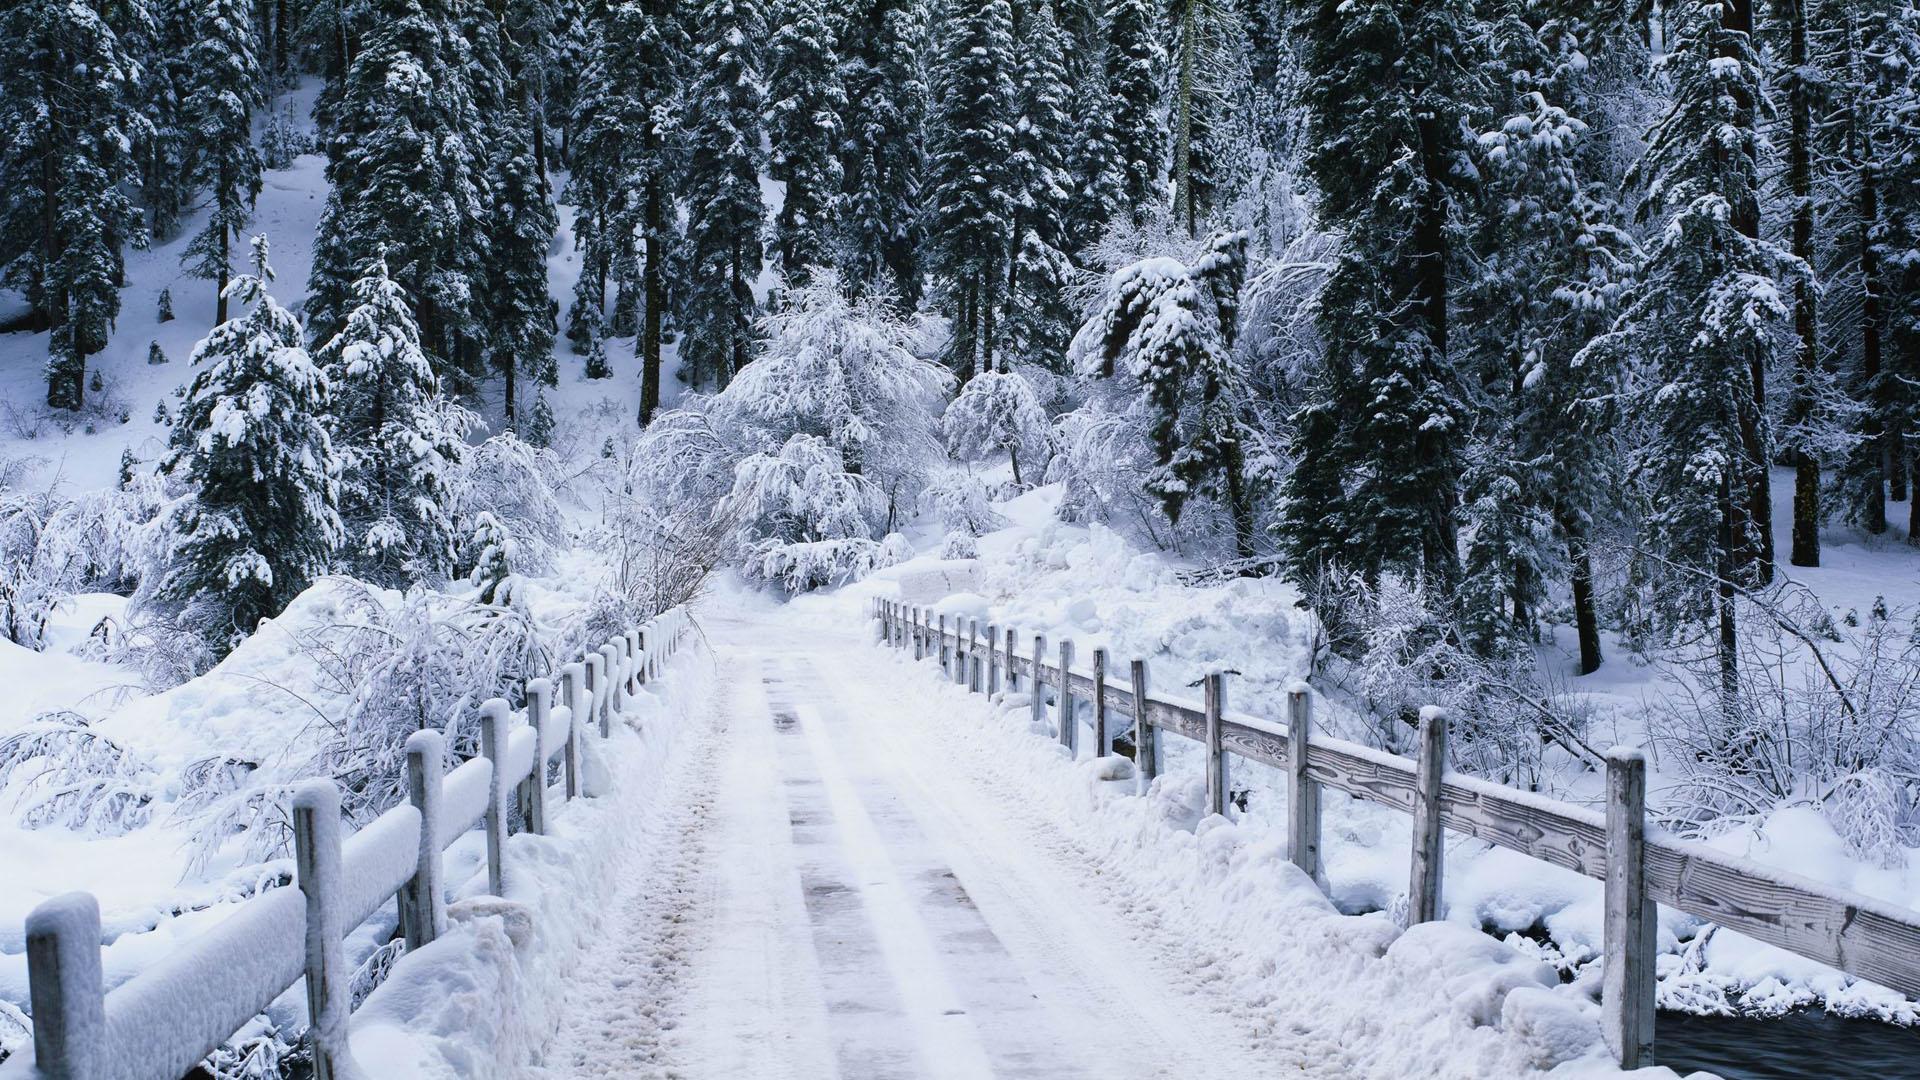 Snowy bridge 1920 x 1080 Forest Photography MIRIADNACOM 1920x1080